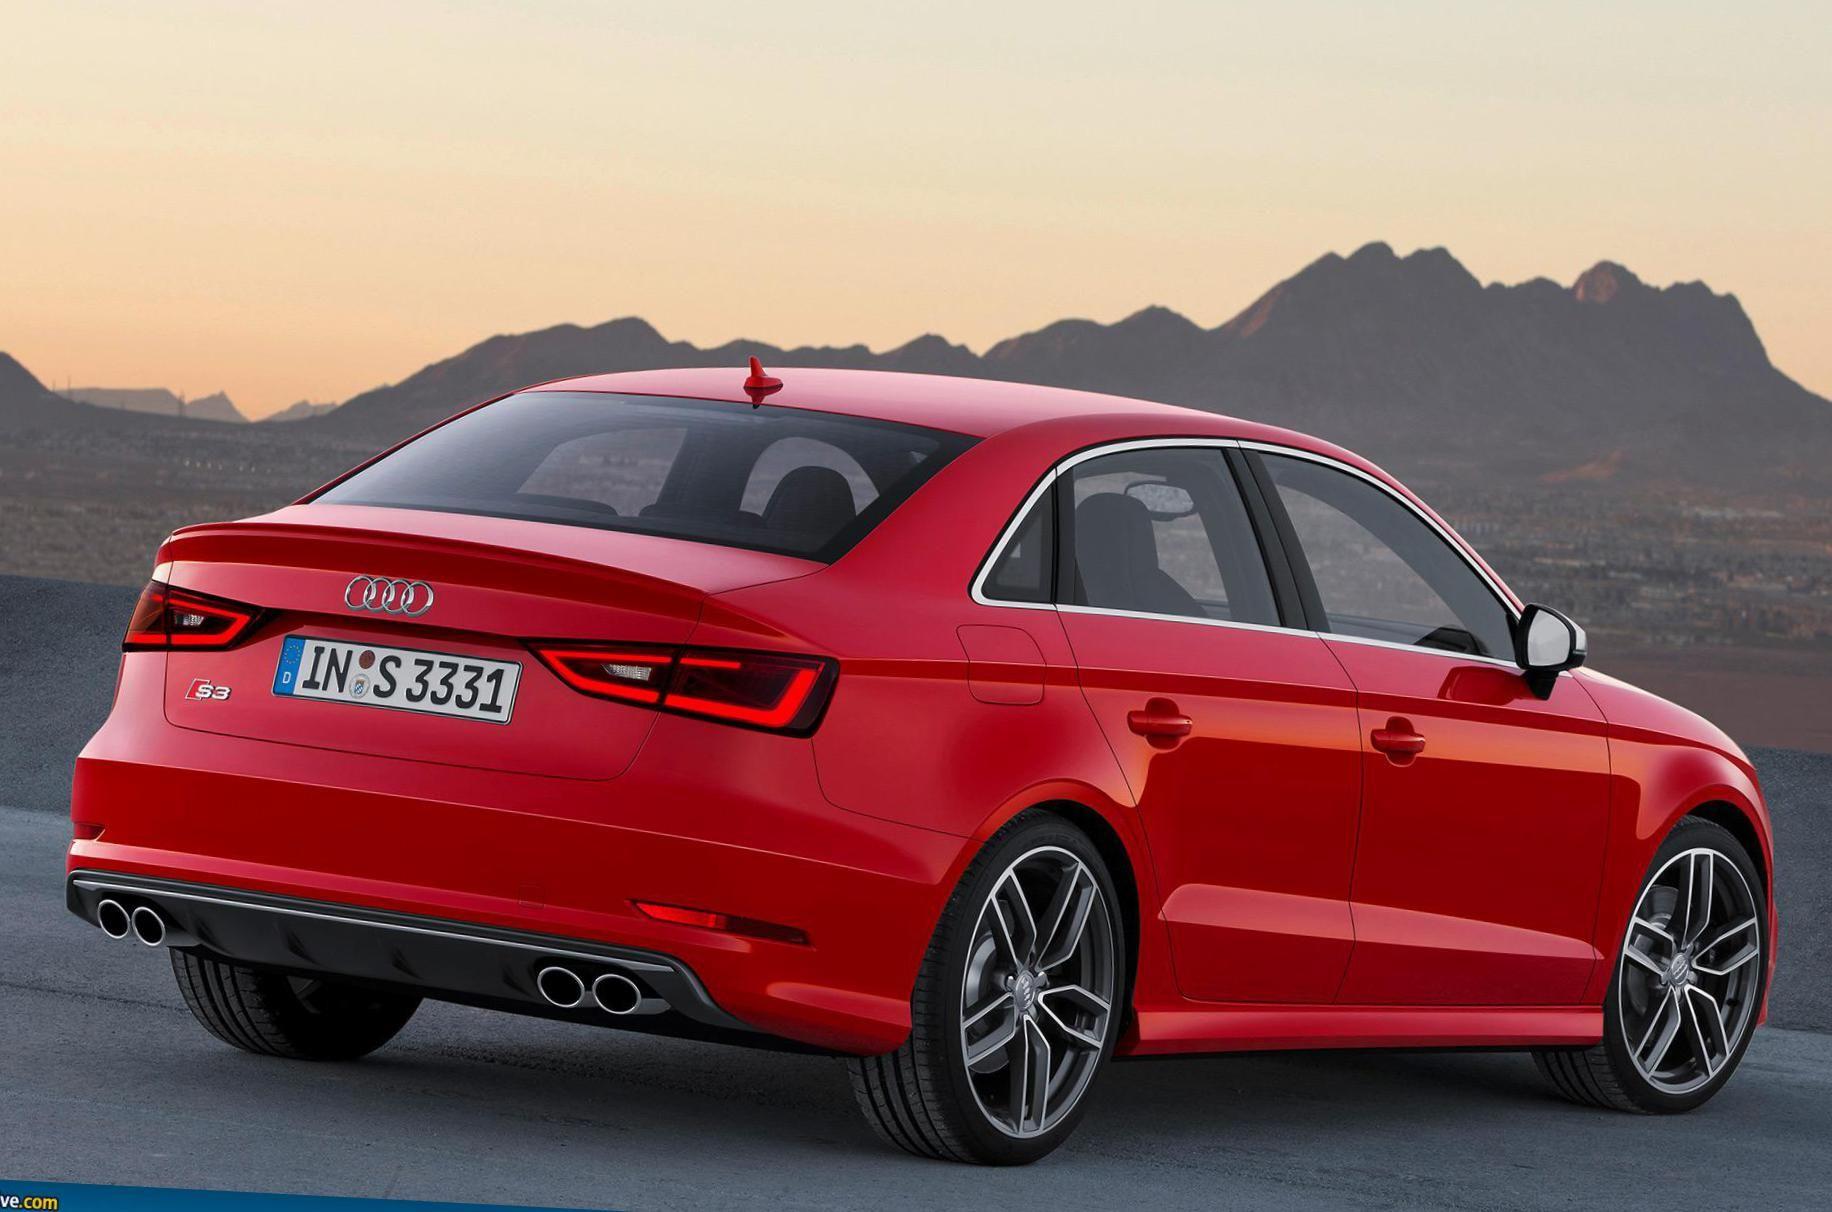 S Sedan Audi Approved Httpautotrascom Auto Pinterest - Audi sedan models